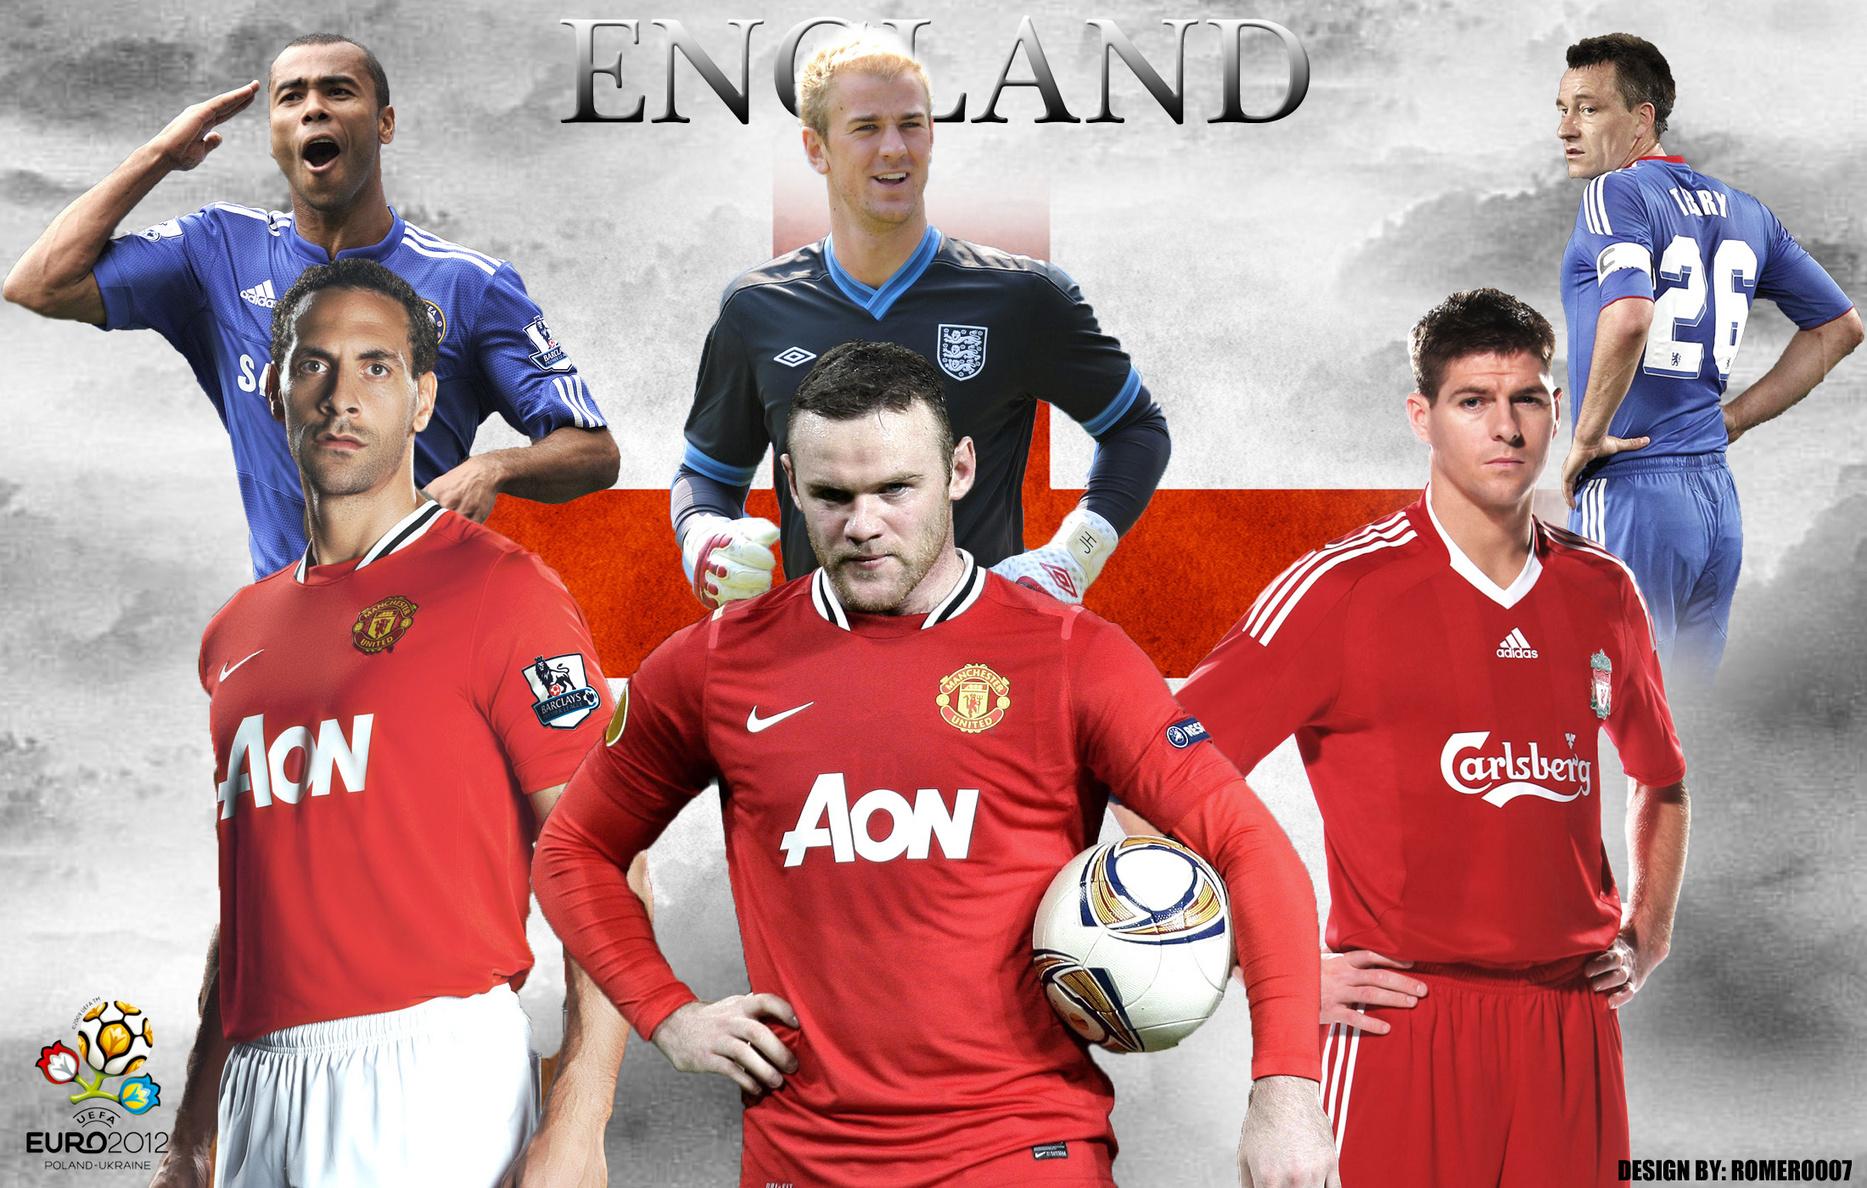 England National football Team wallpapers   Hot HD Wallpapers 1867x1188